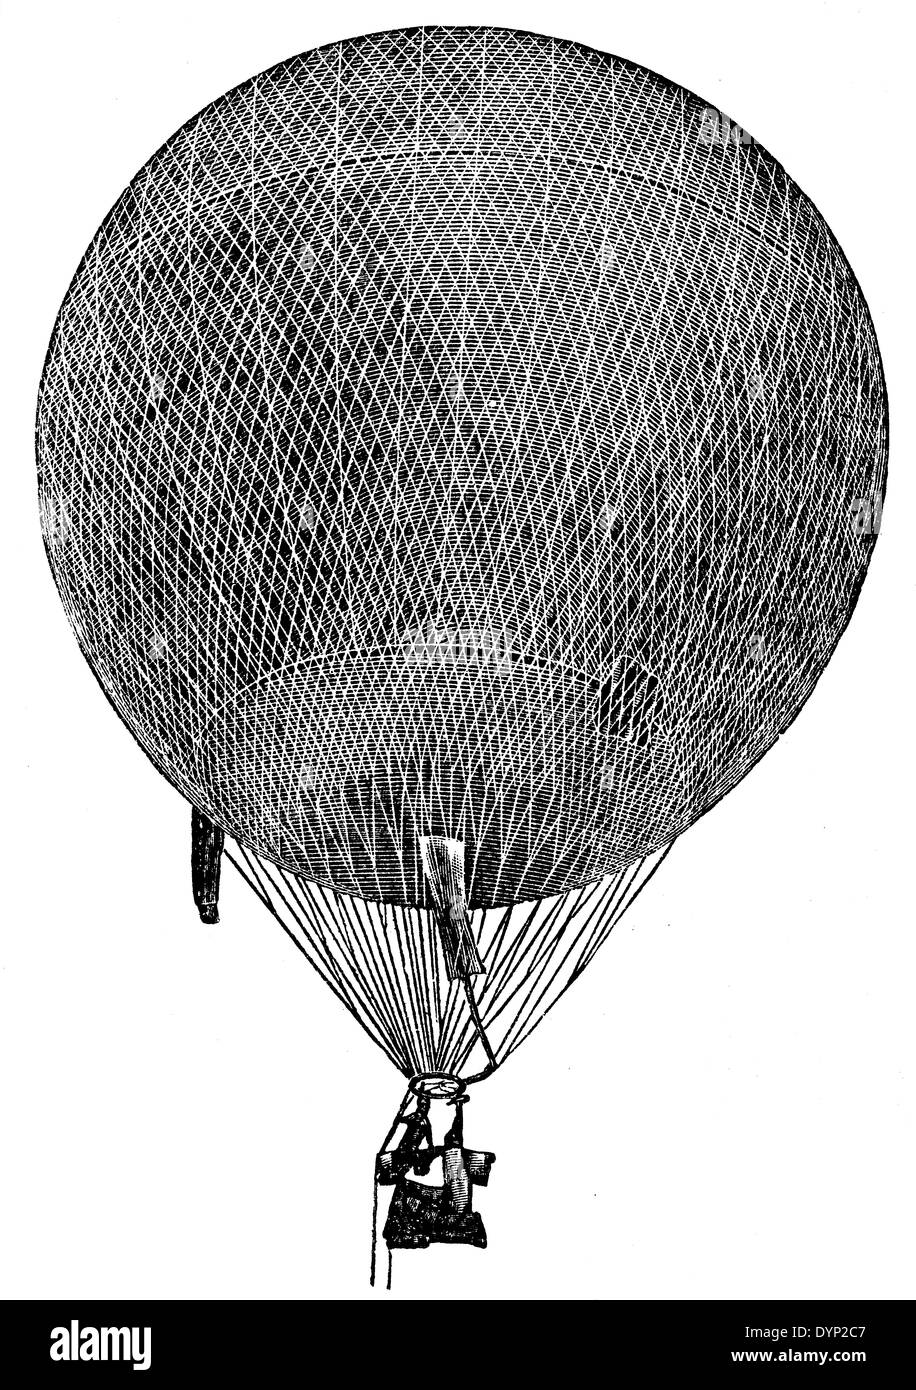 19th century aerostat, illustration from Soviet encyclopedia, 1926 - Stock Image